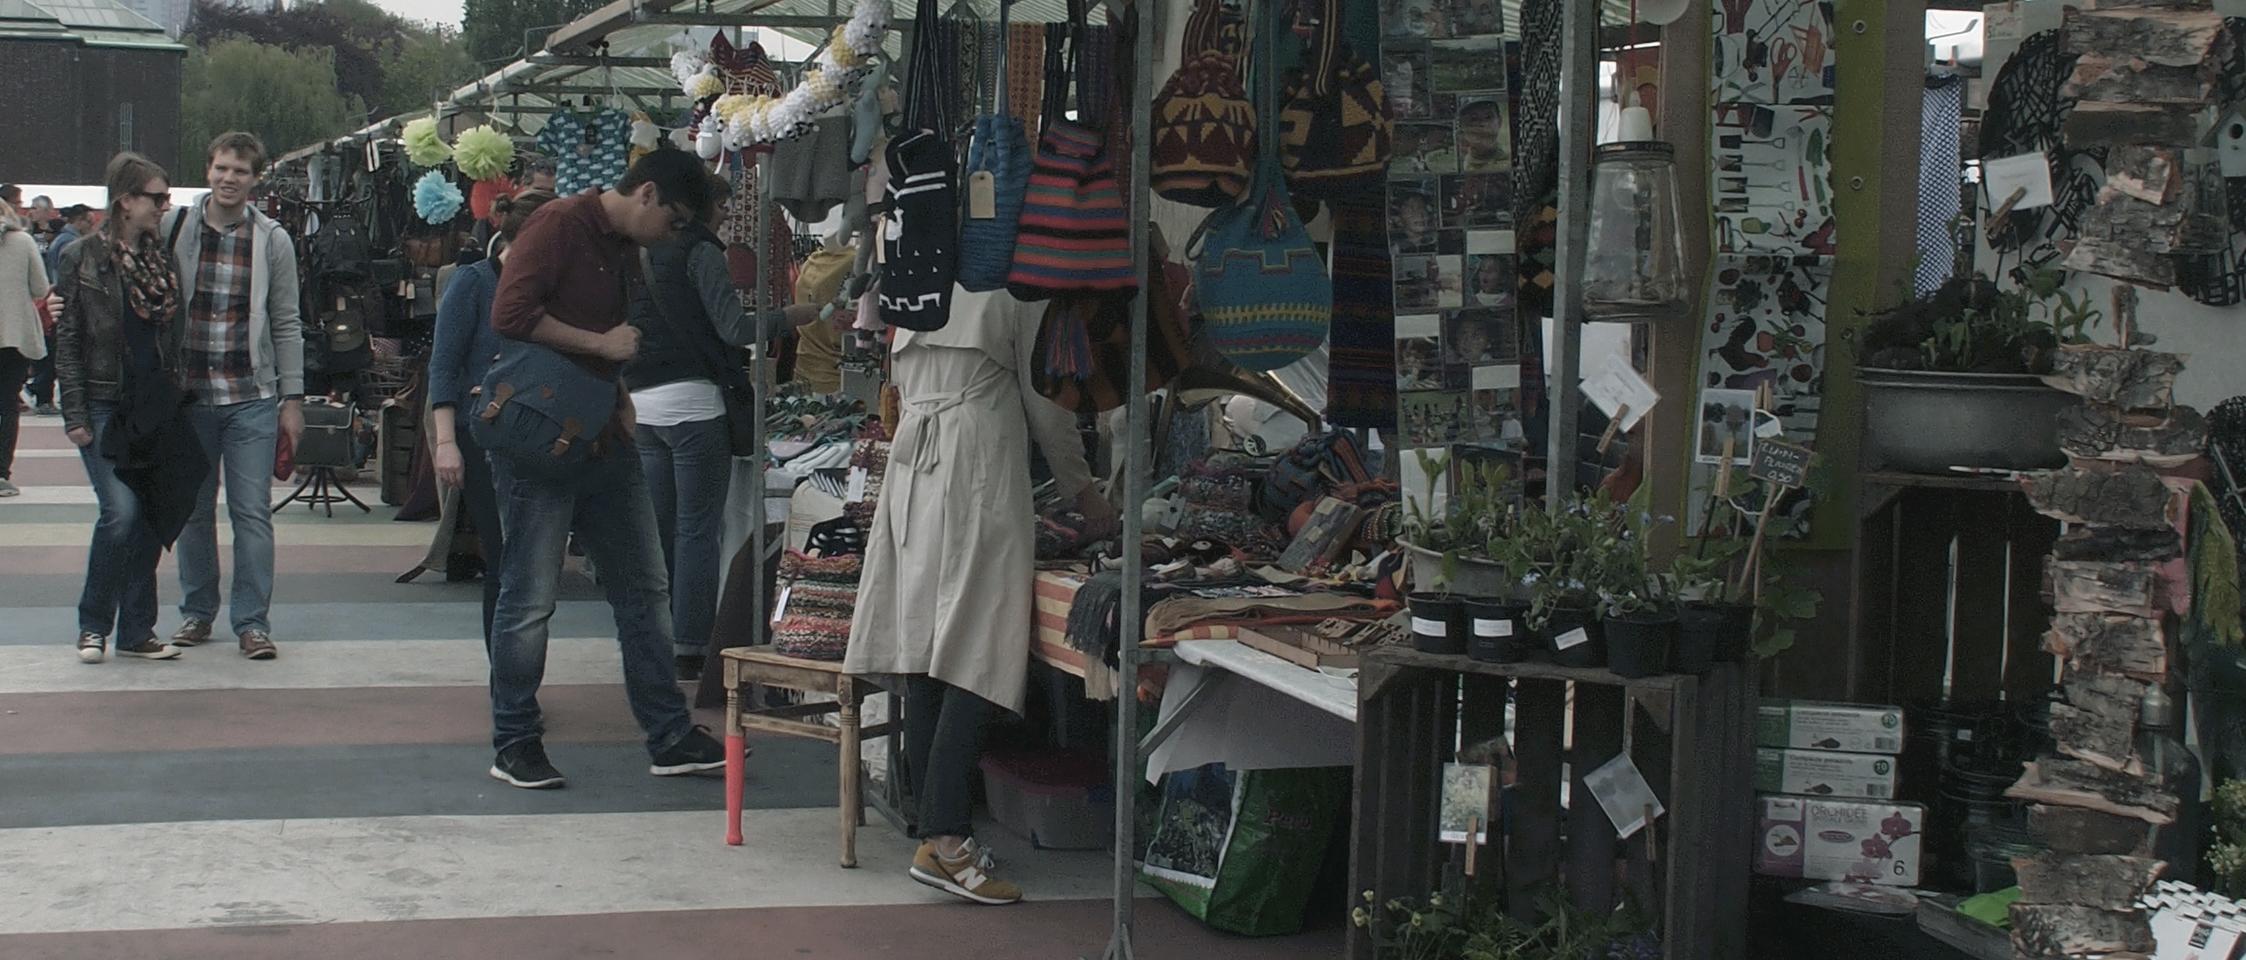 SWAN Market Rotterdam